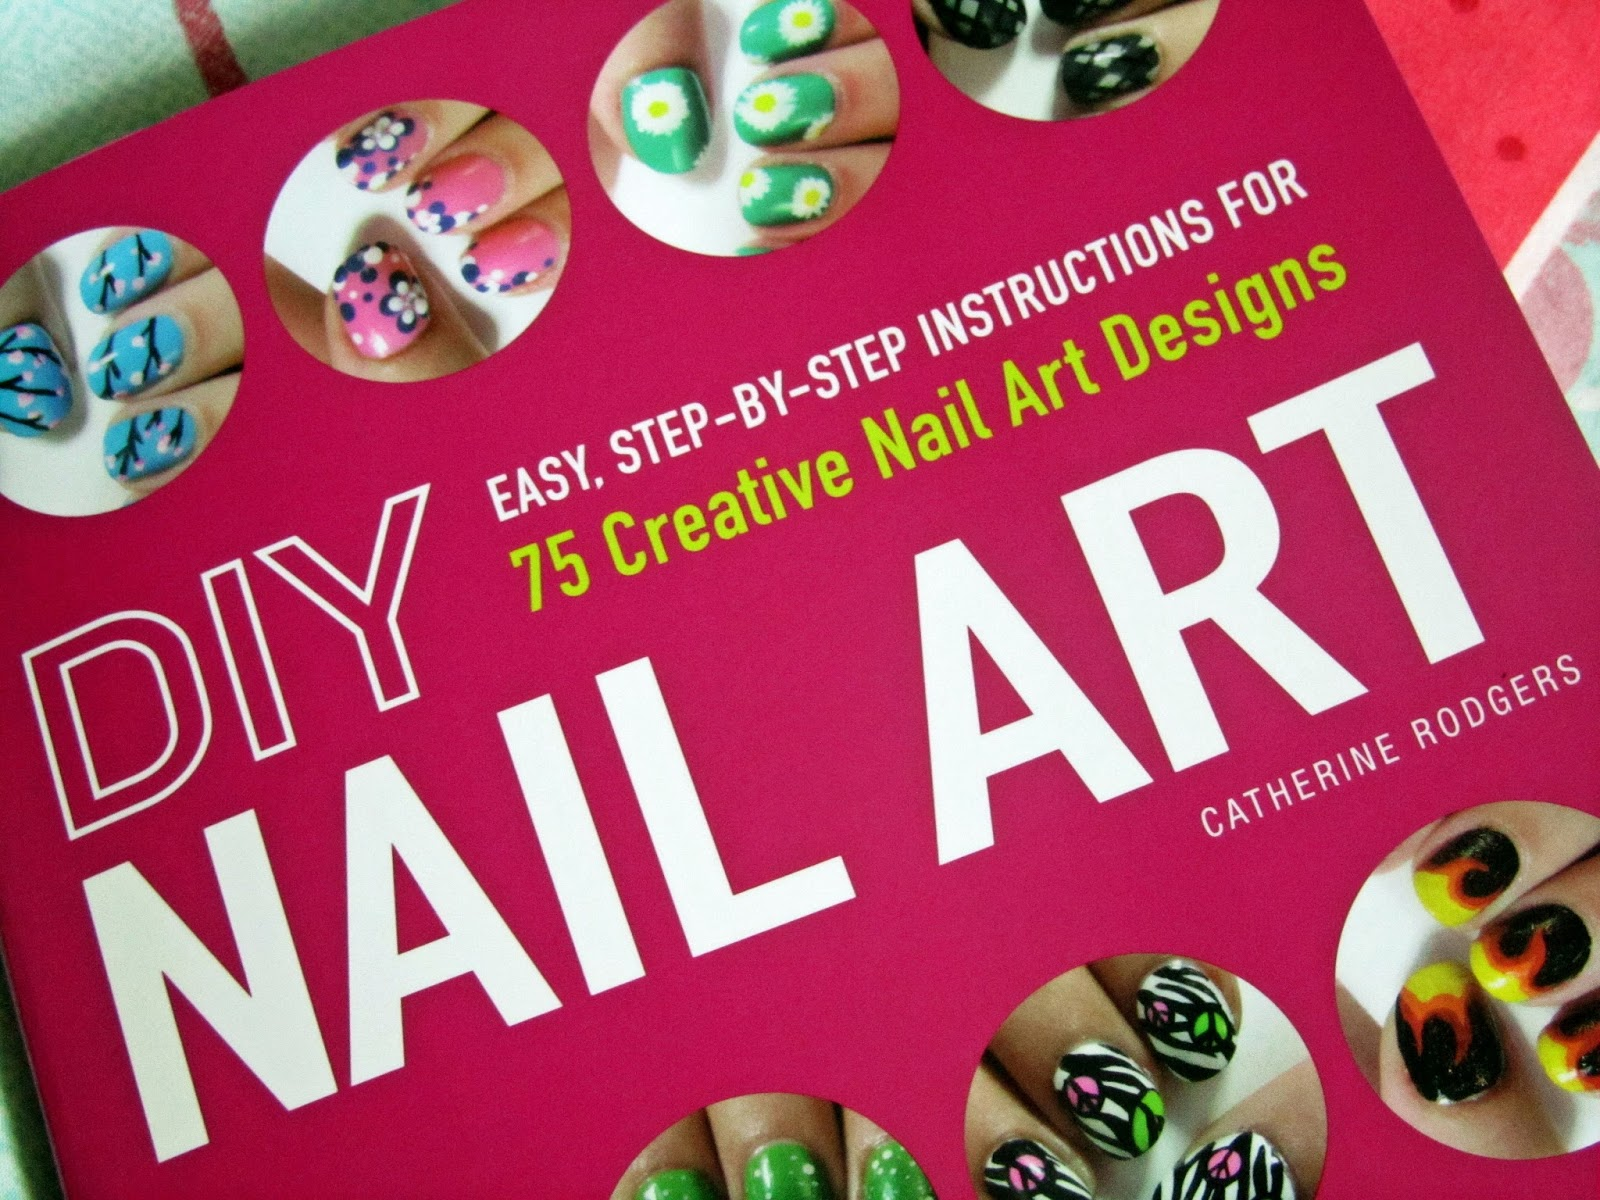 Diy Nail Art Book Review Polka Spots And Freckle Dots